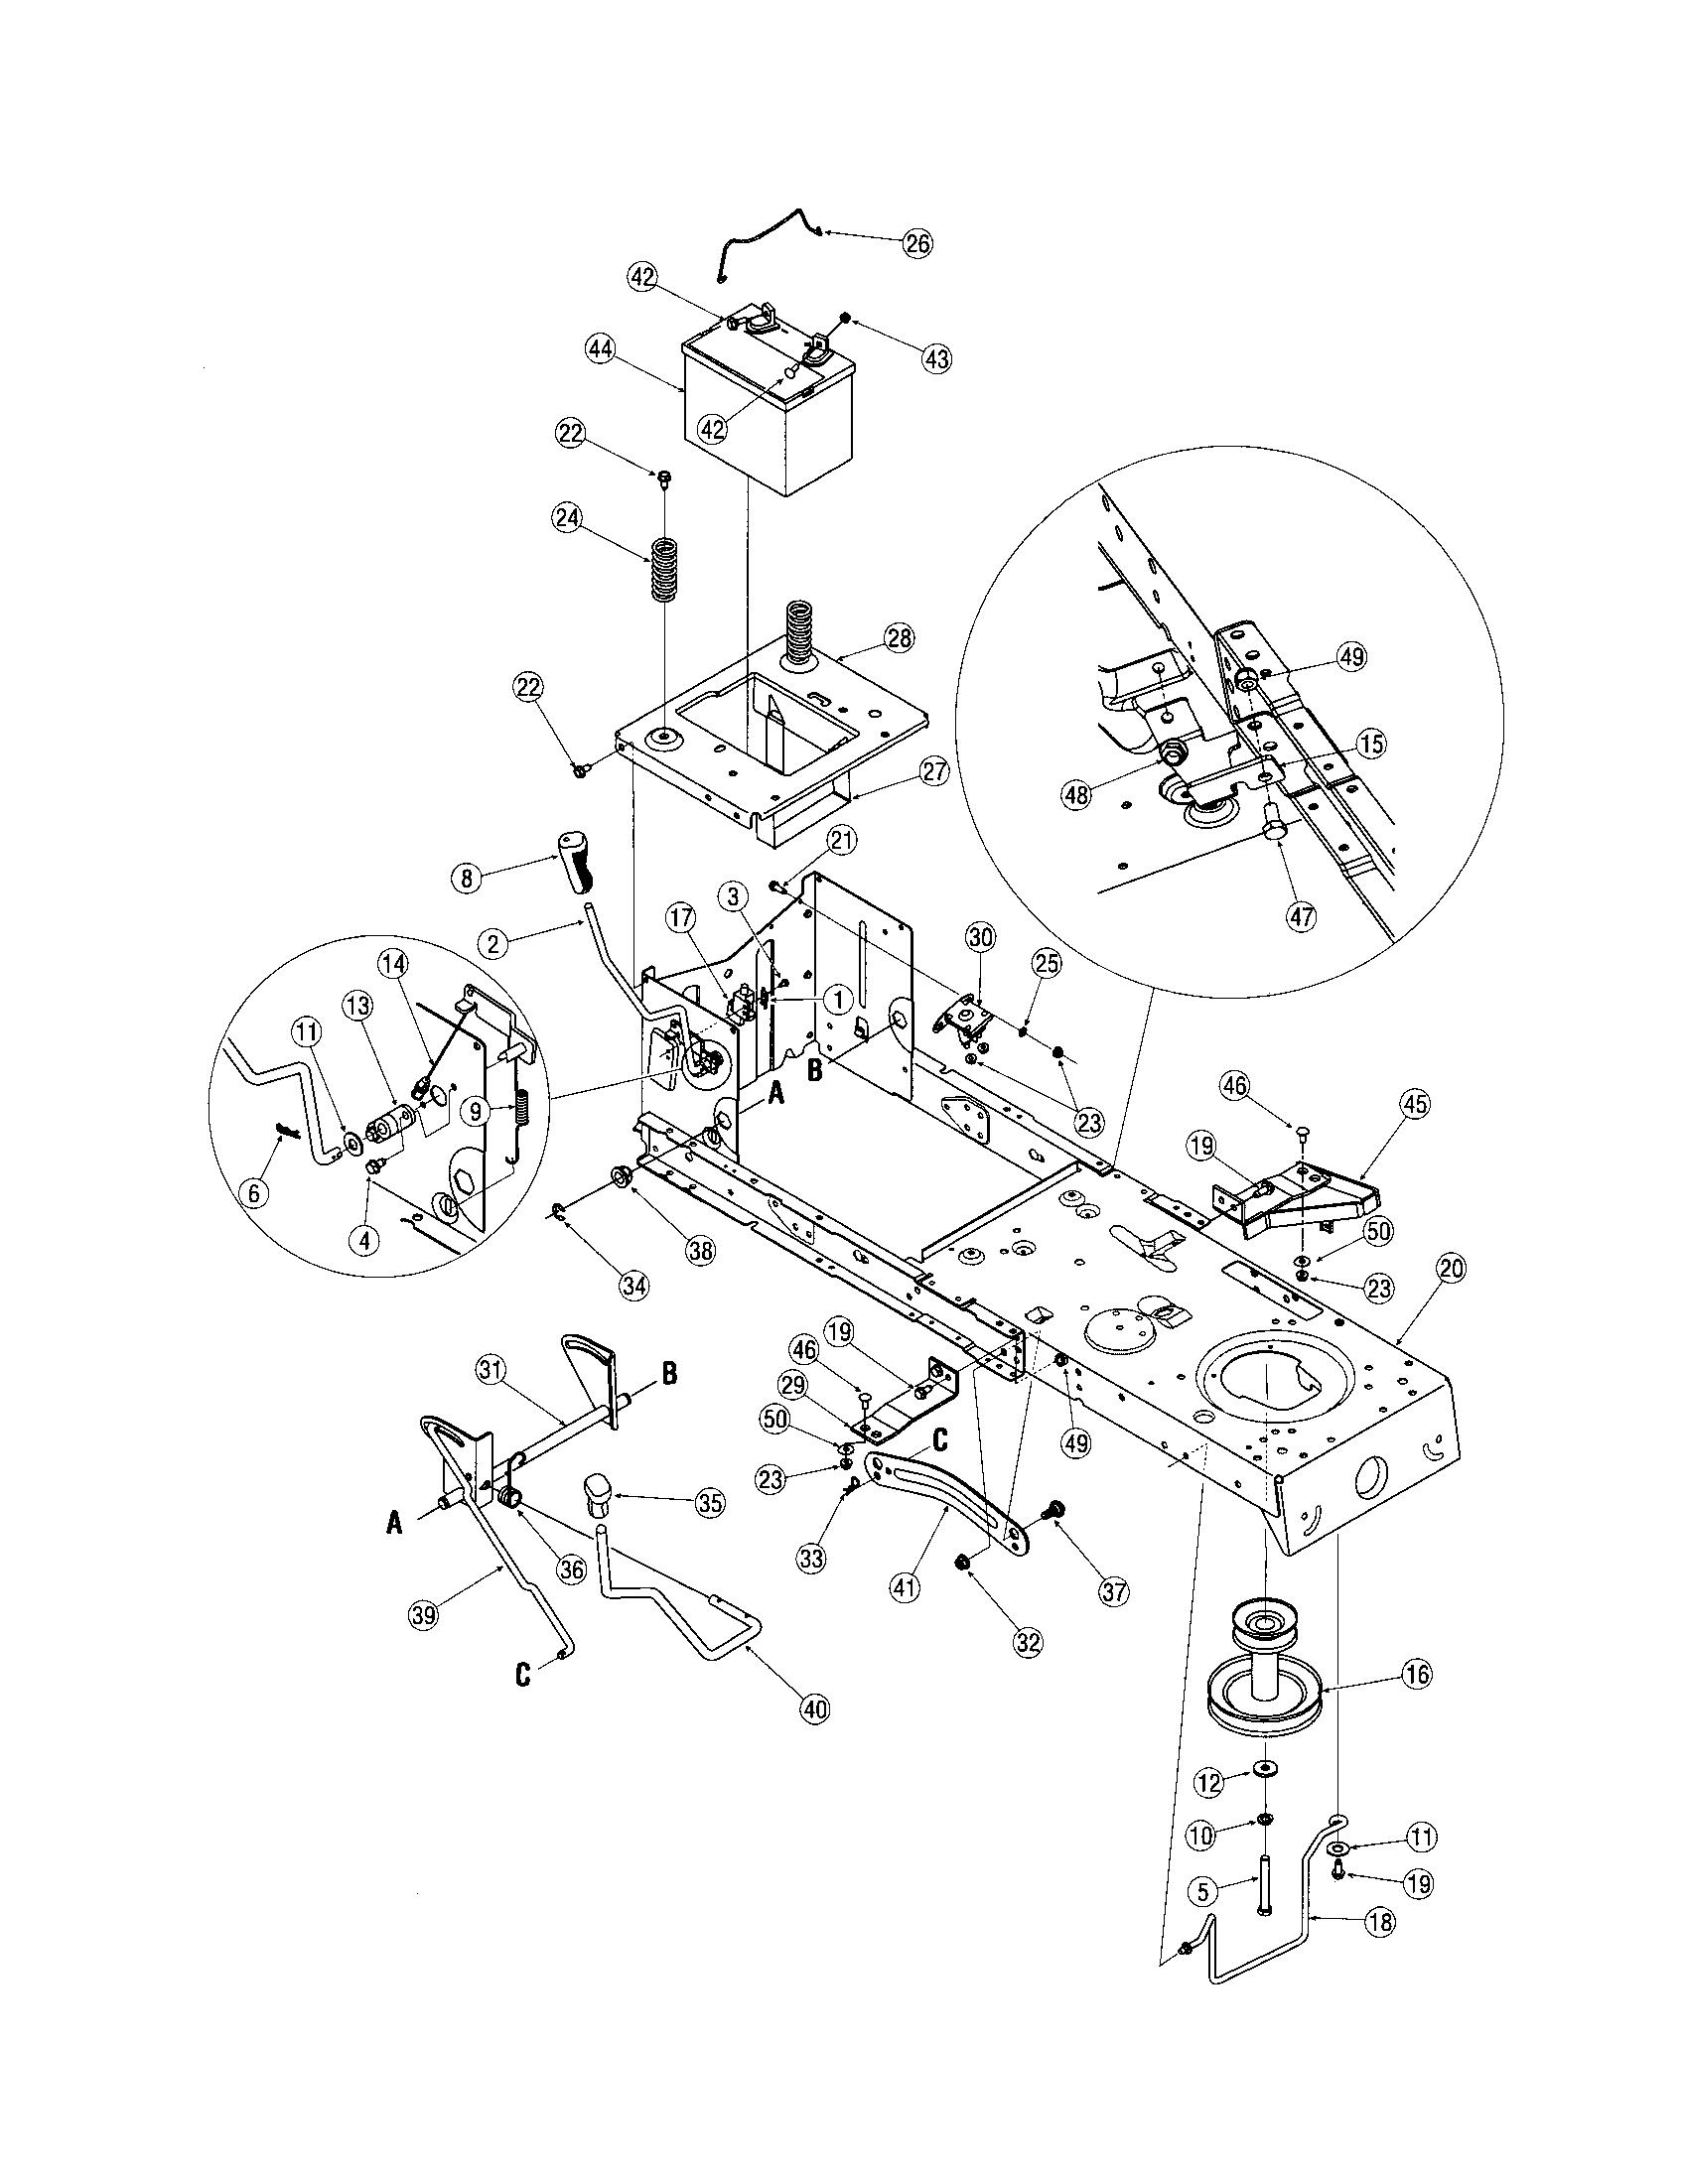 hight resolution of troy bilt riding mower wiring diagram